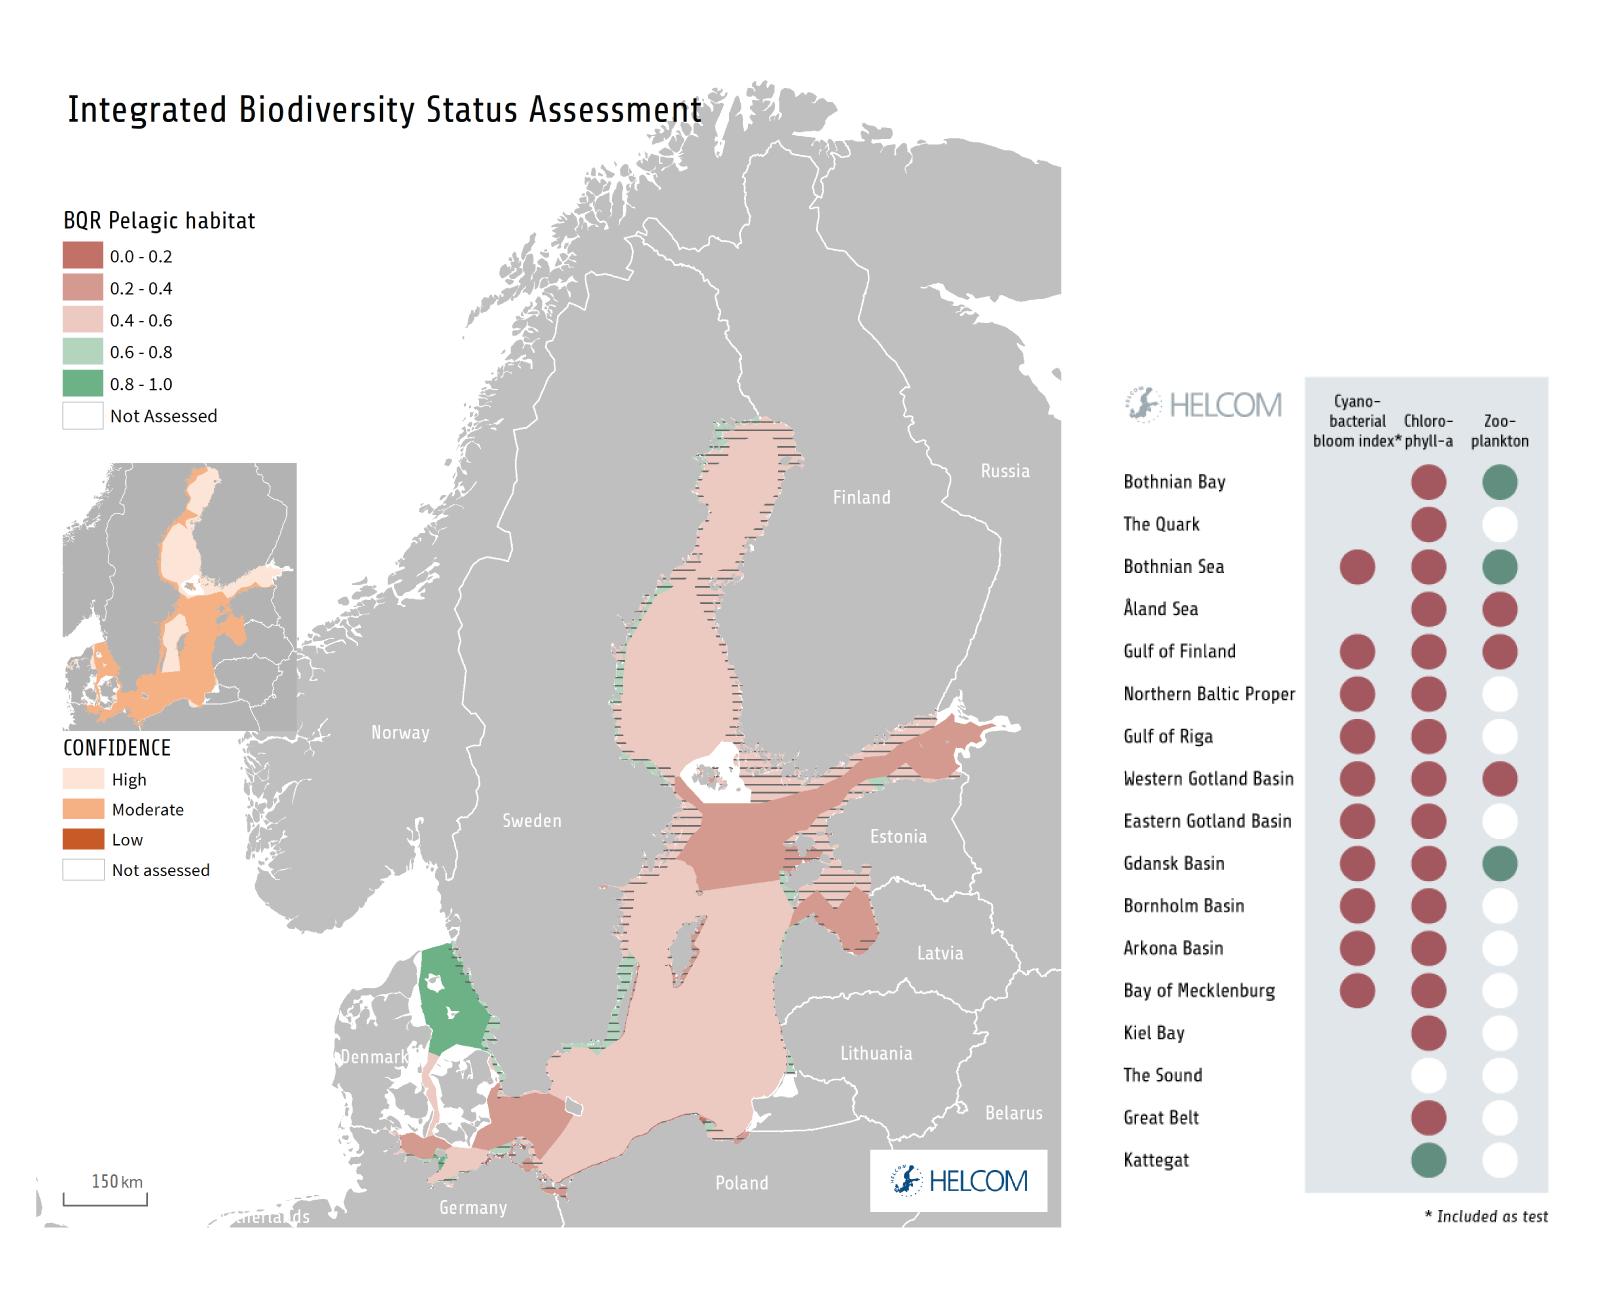 HELCOM HOLASII Fig 5.2.1 Integrated Biodiversity Status Assessment For Pelagic Habitats